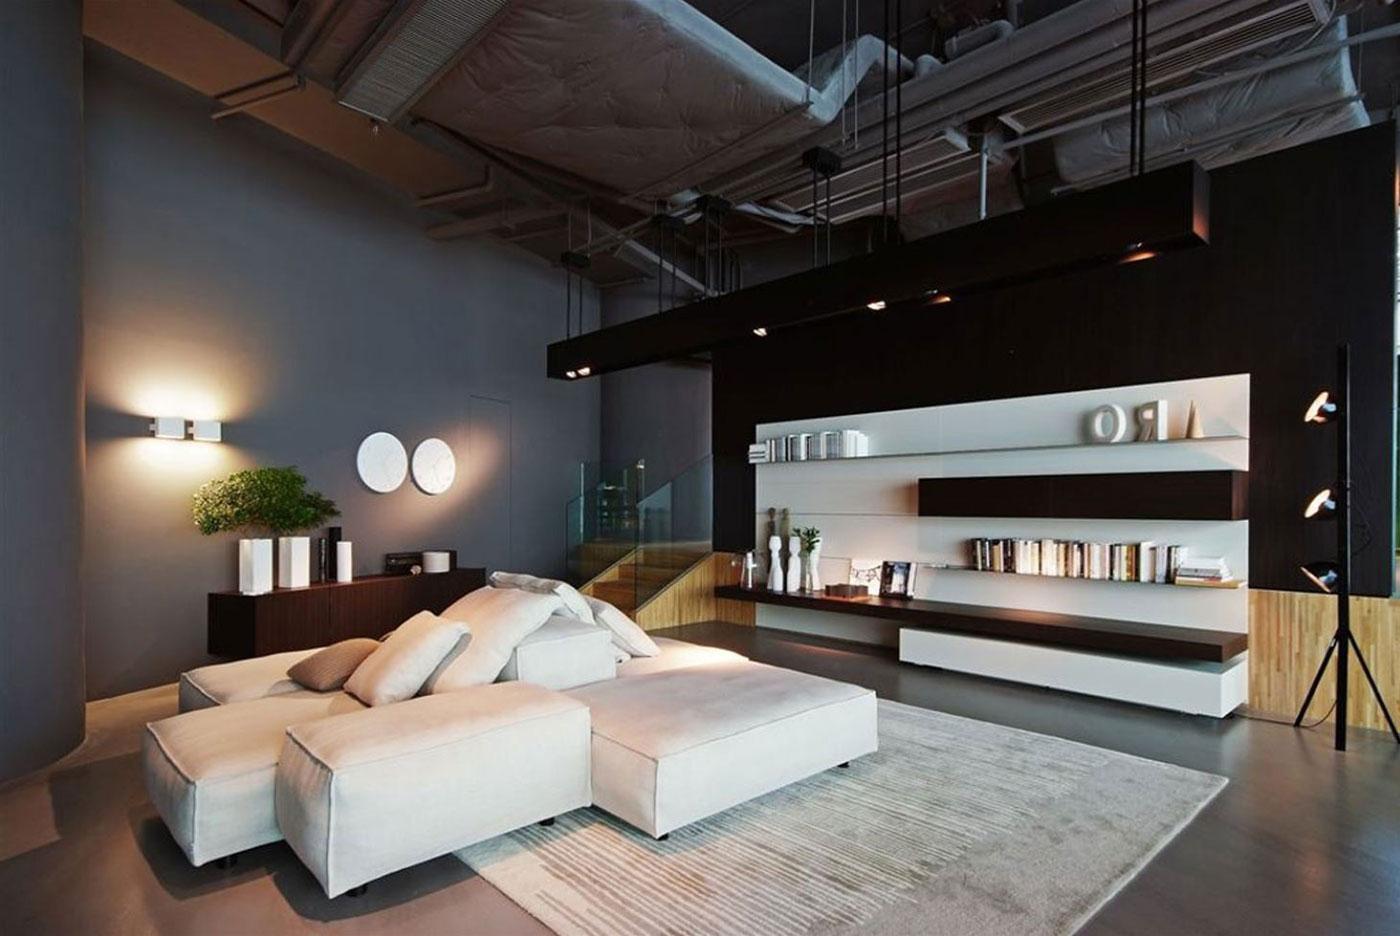 Obegi Home Wall Systems Porro Collection 8